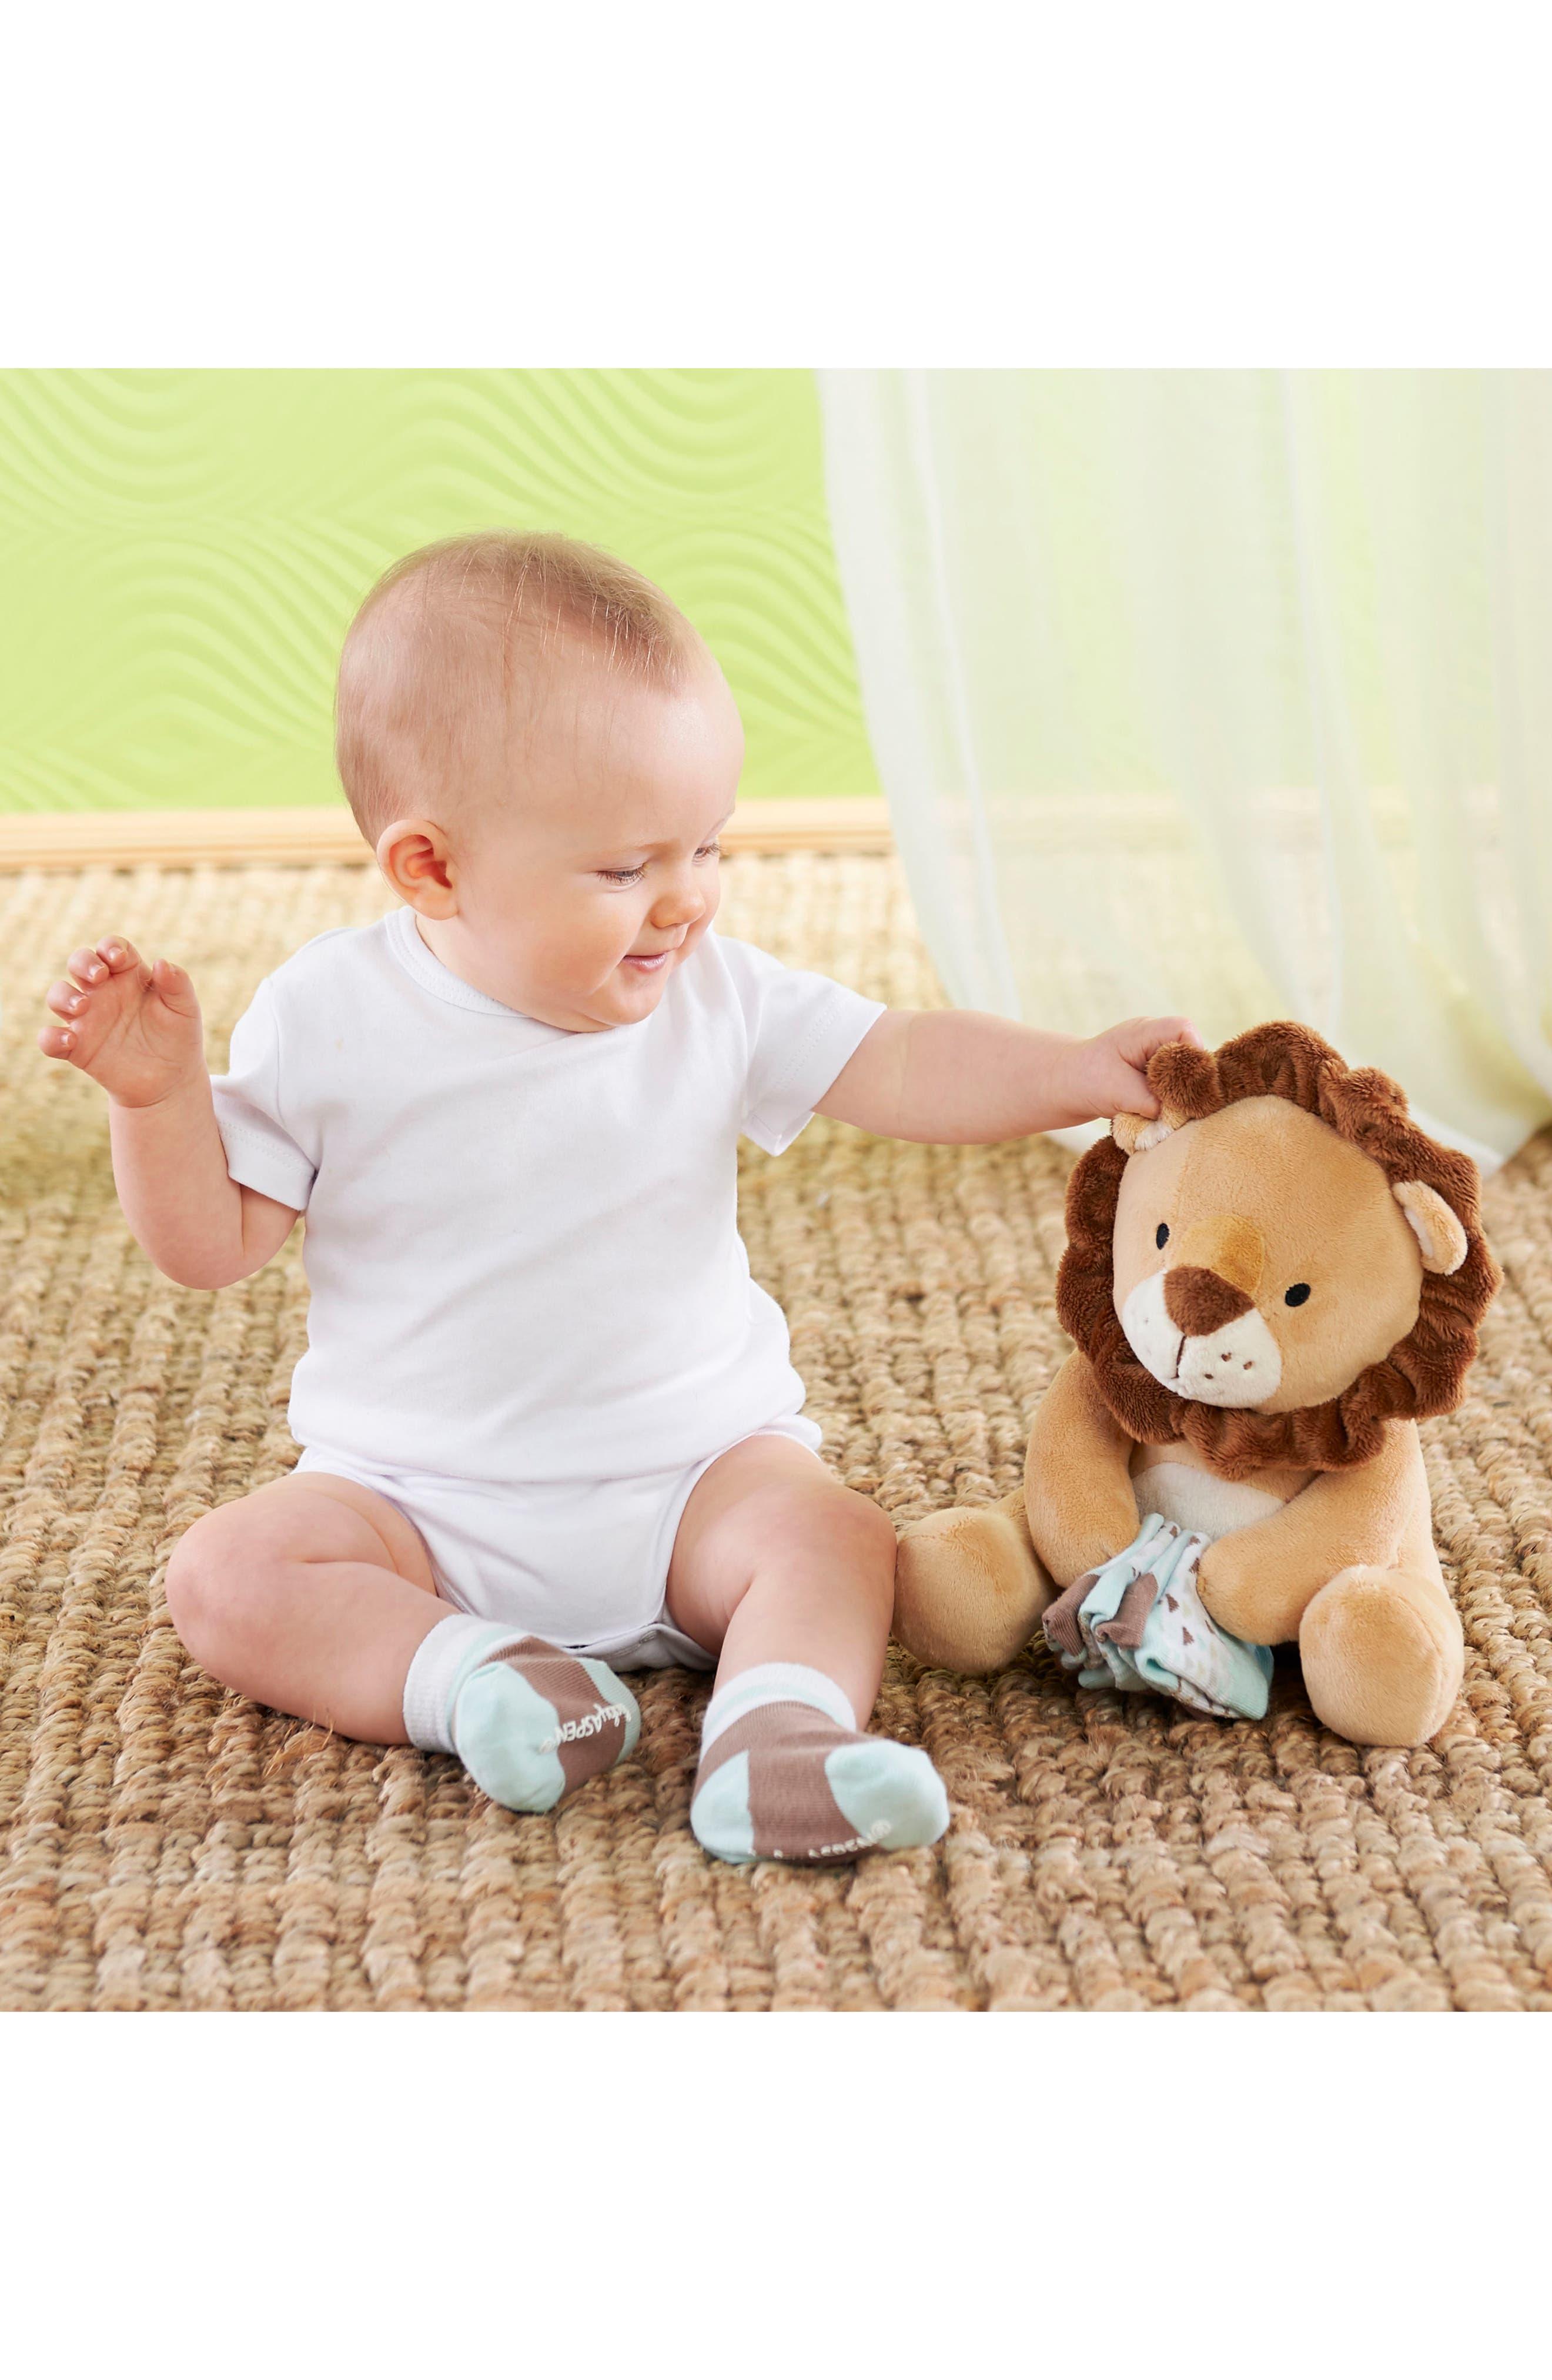 Lion Safari Hooded Blanket, 3-Pack Socks & Stuffed Animal Set,                             Alternate thumbnail 2, color,